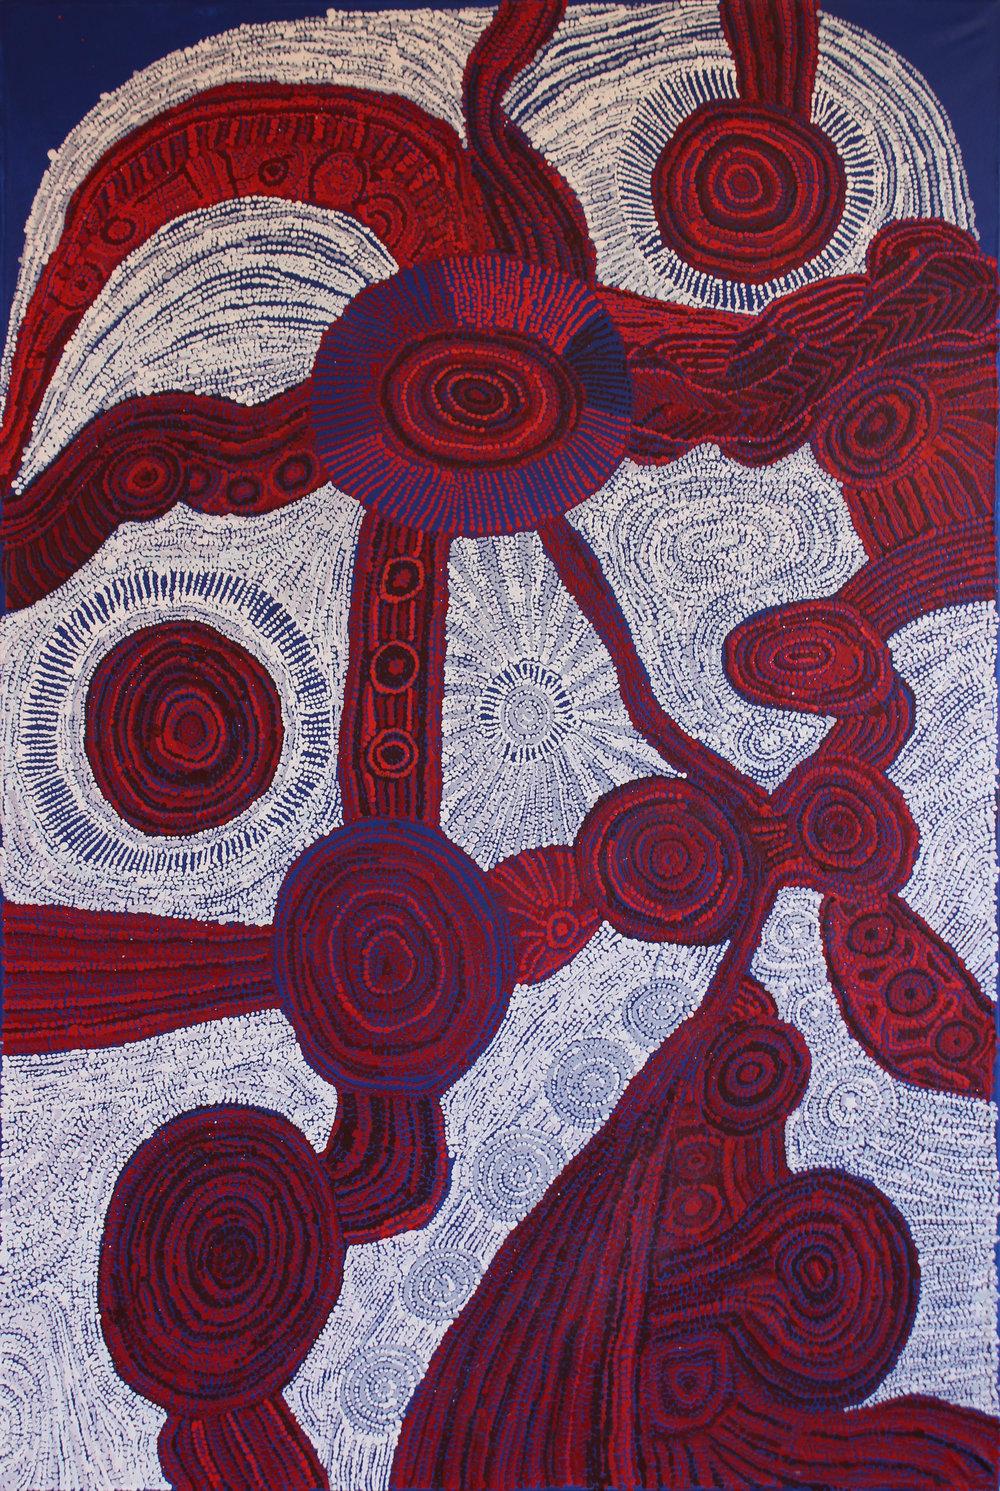 Betty Kuntiwa Pumani  Antara  40 x 72 inches (122 x 183cm) acrylic on linen Mimili Maku Arts Catalog #662-17   EMAIL INQUIRY